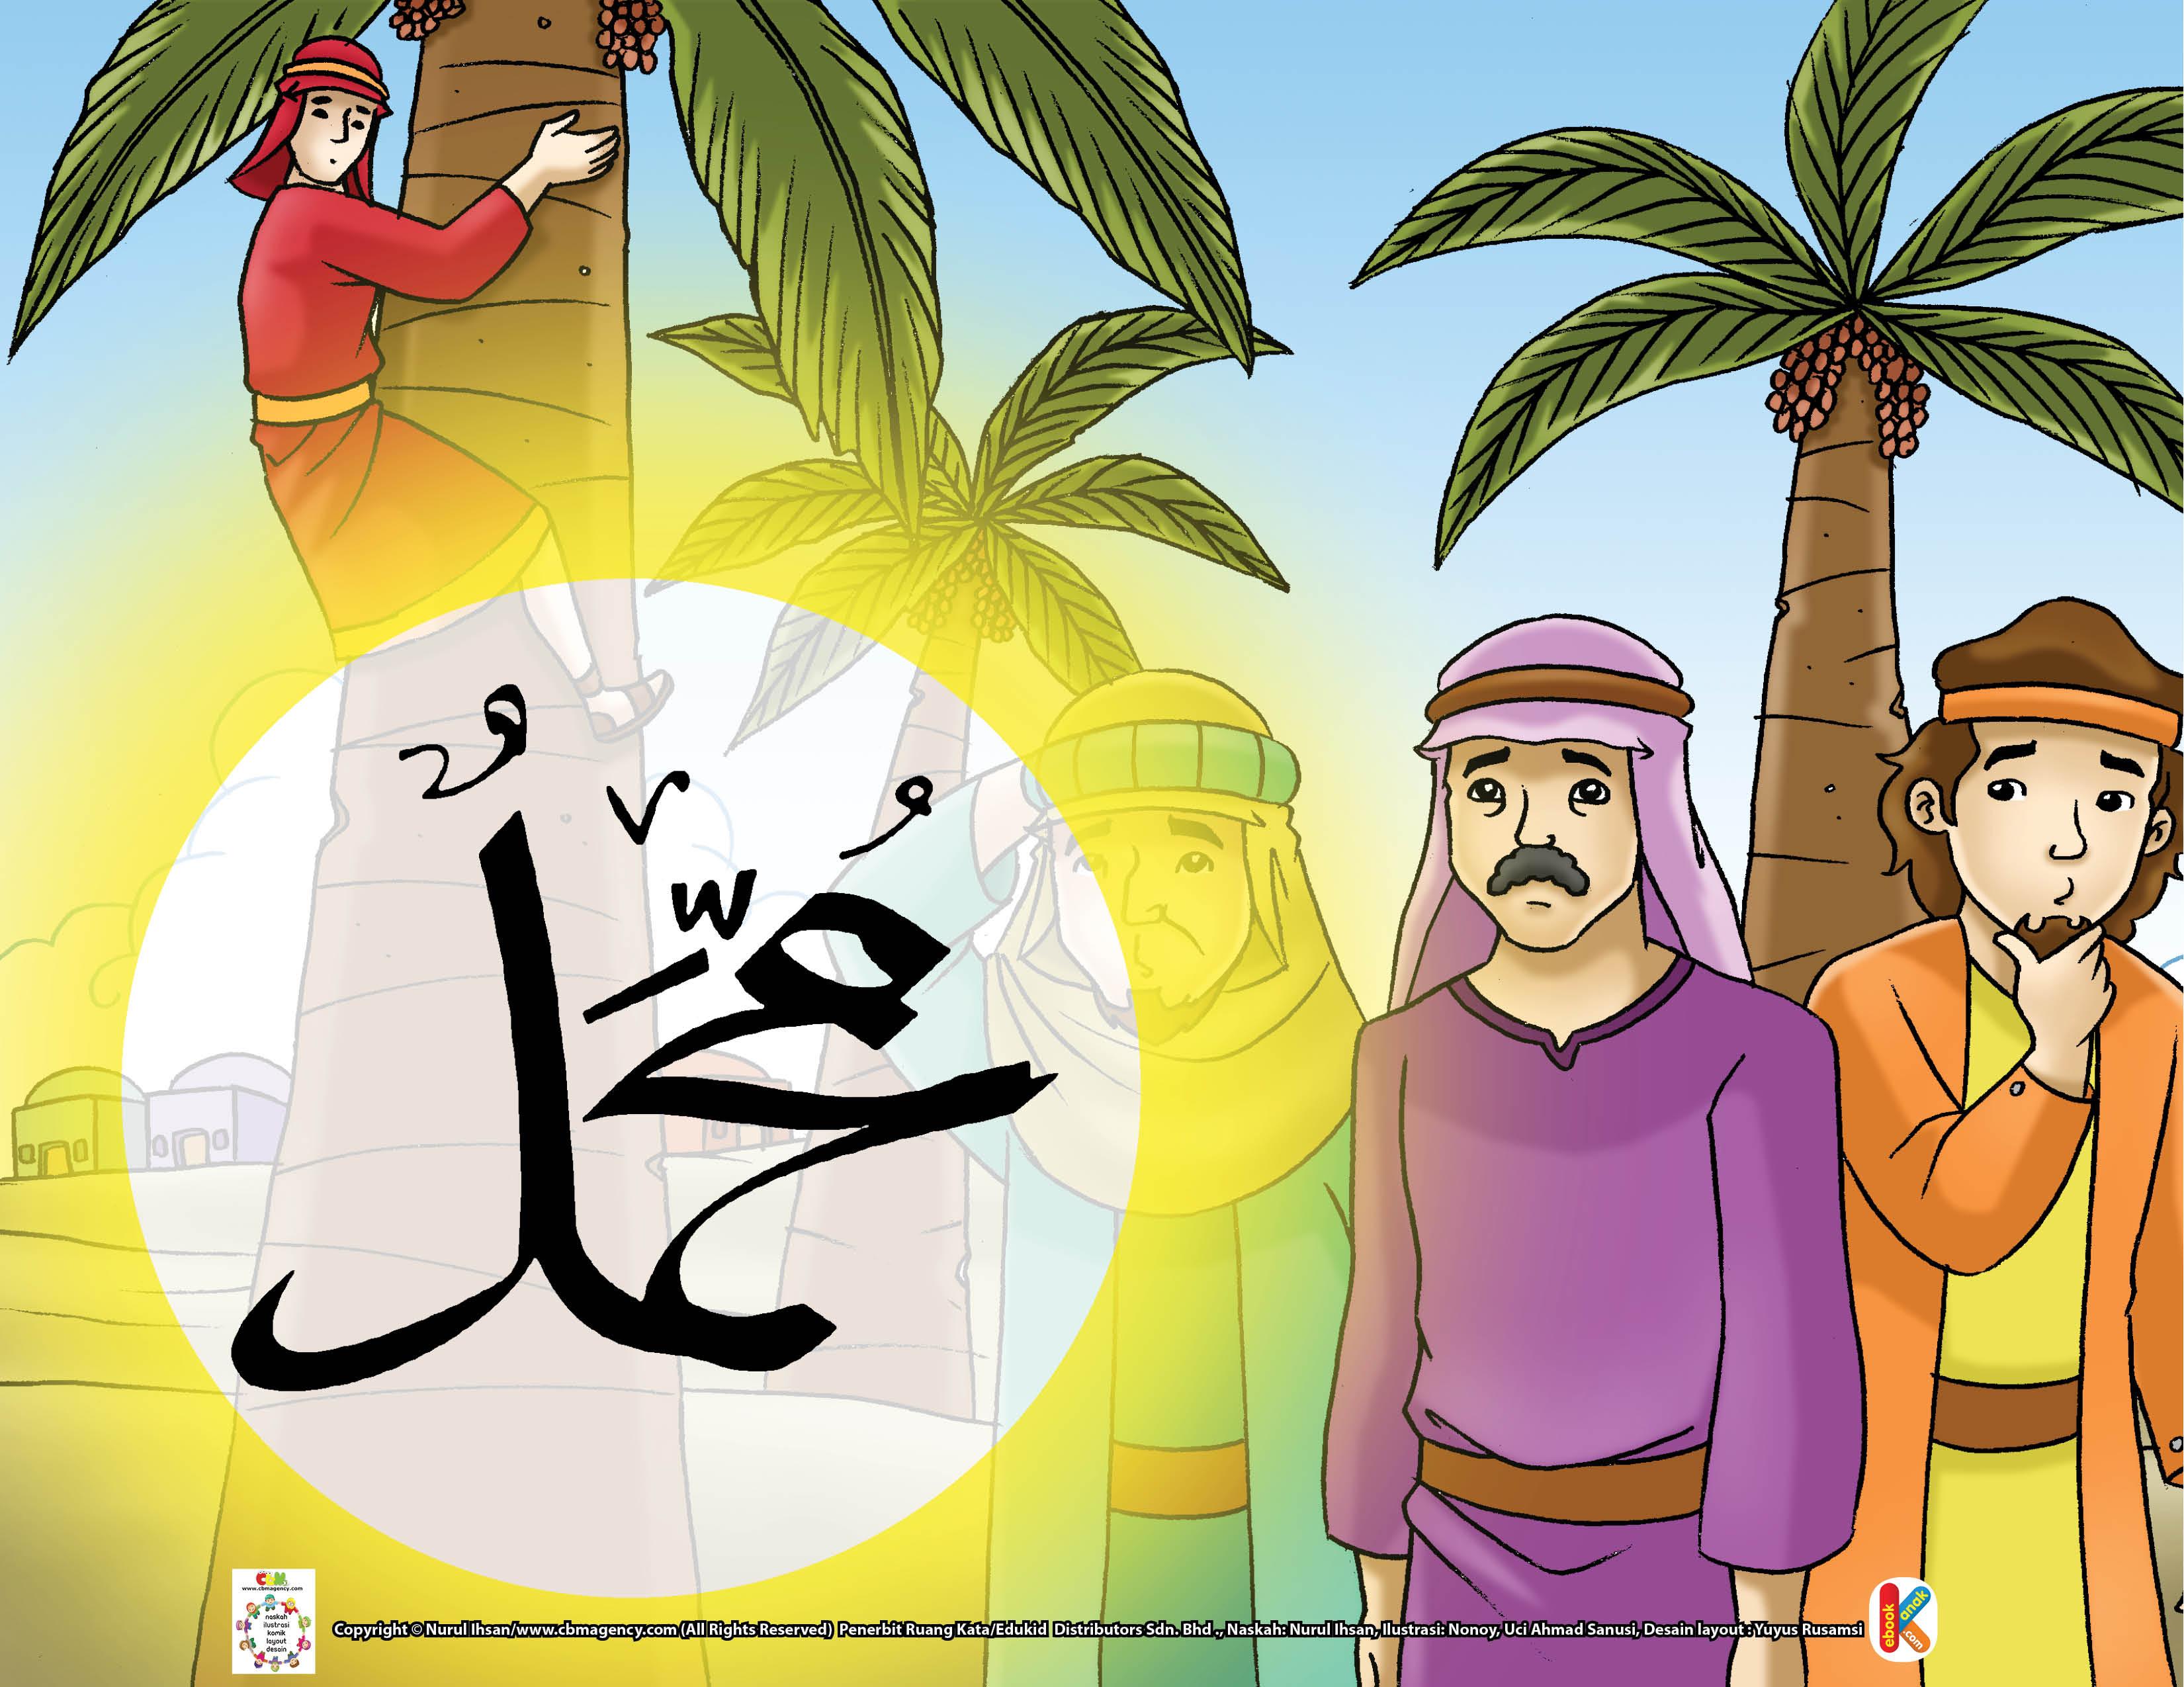 Abdullah bin Mas'ud juga tercatat sebagai muslim pertama yang mengumandangkan Al-Qur'an dengan suara merdu dan lantang.